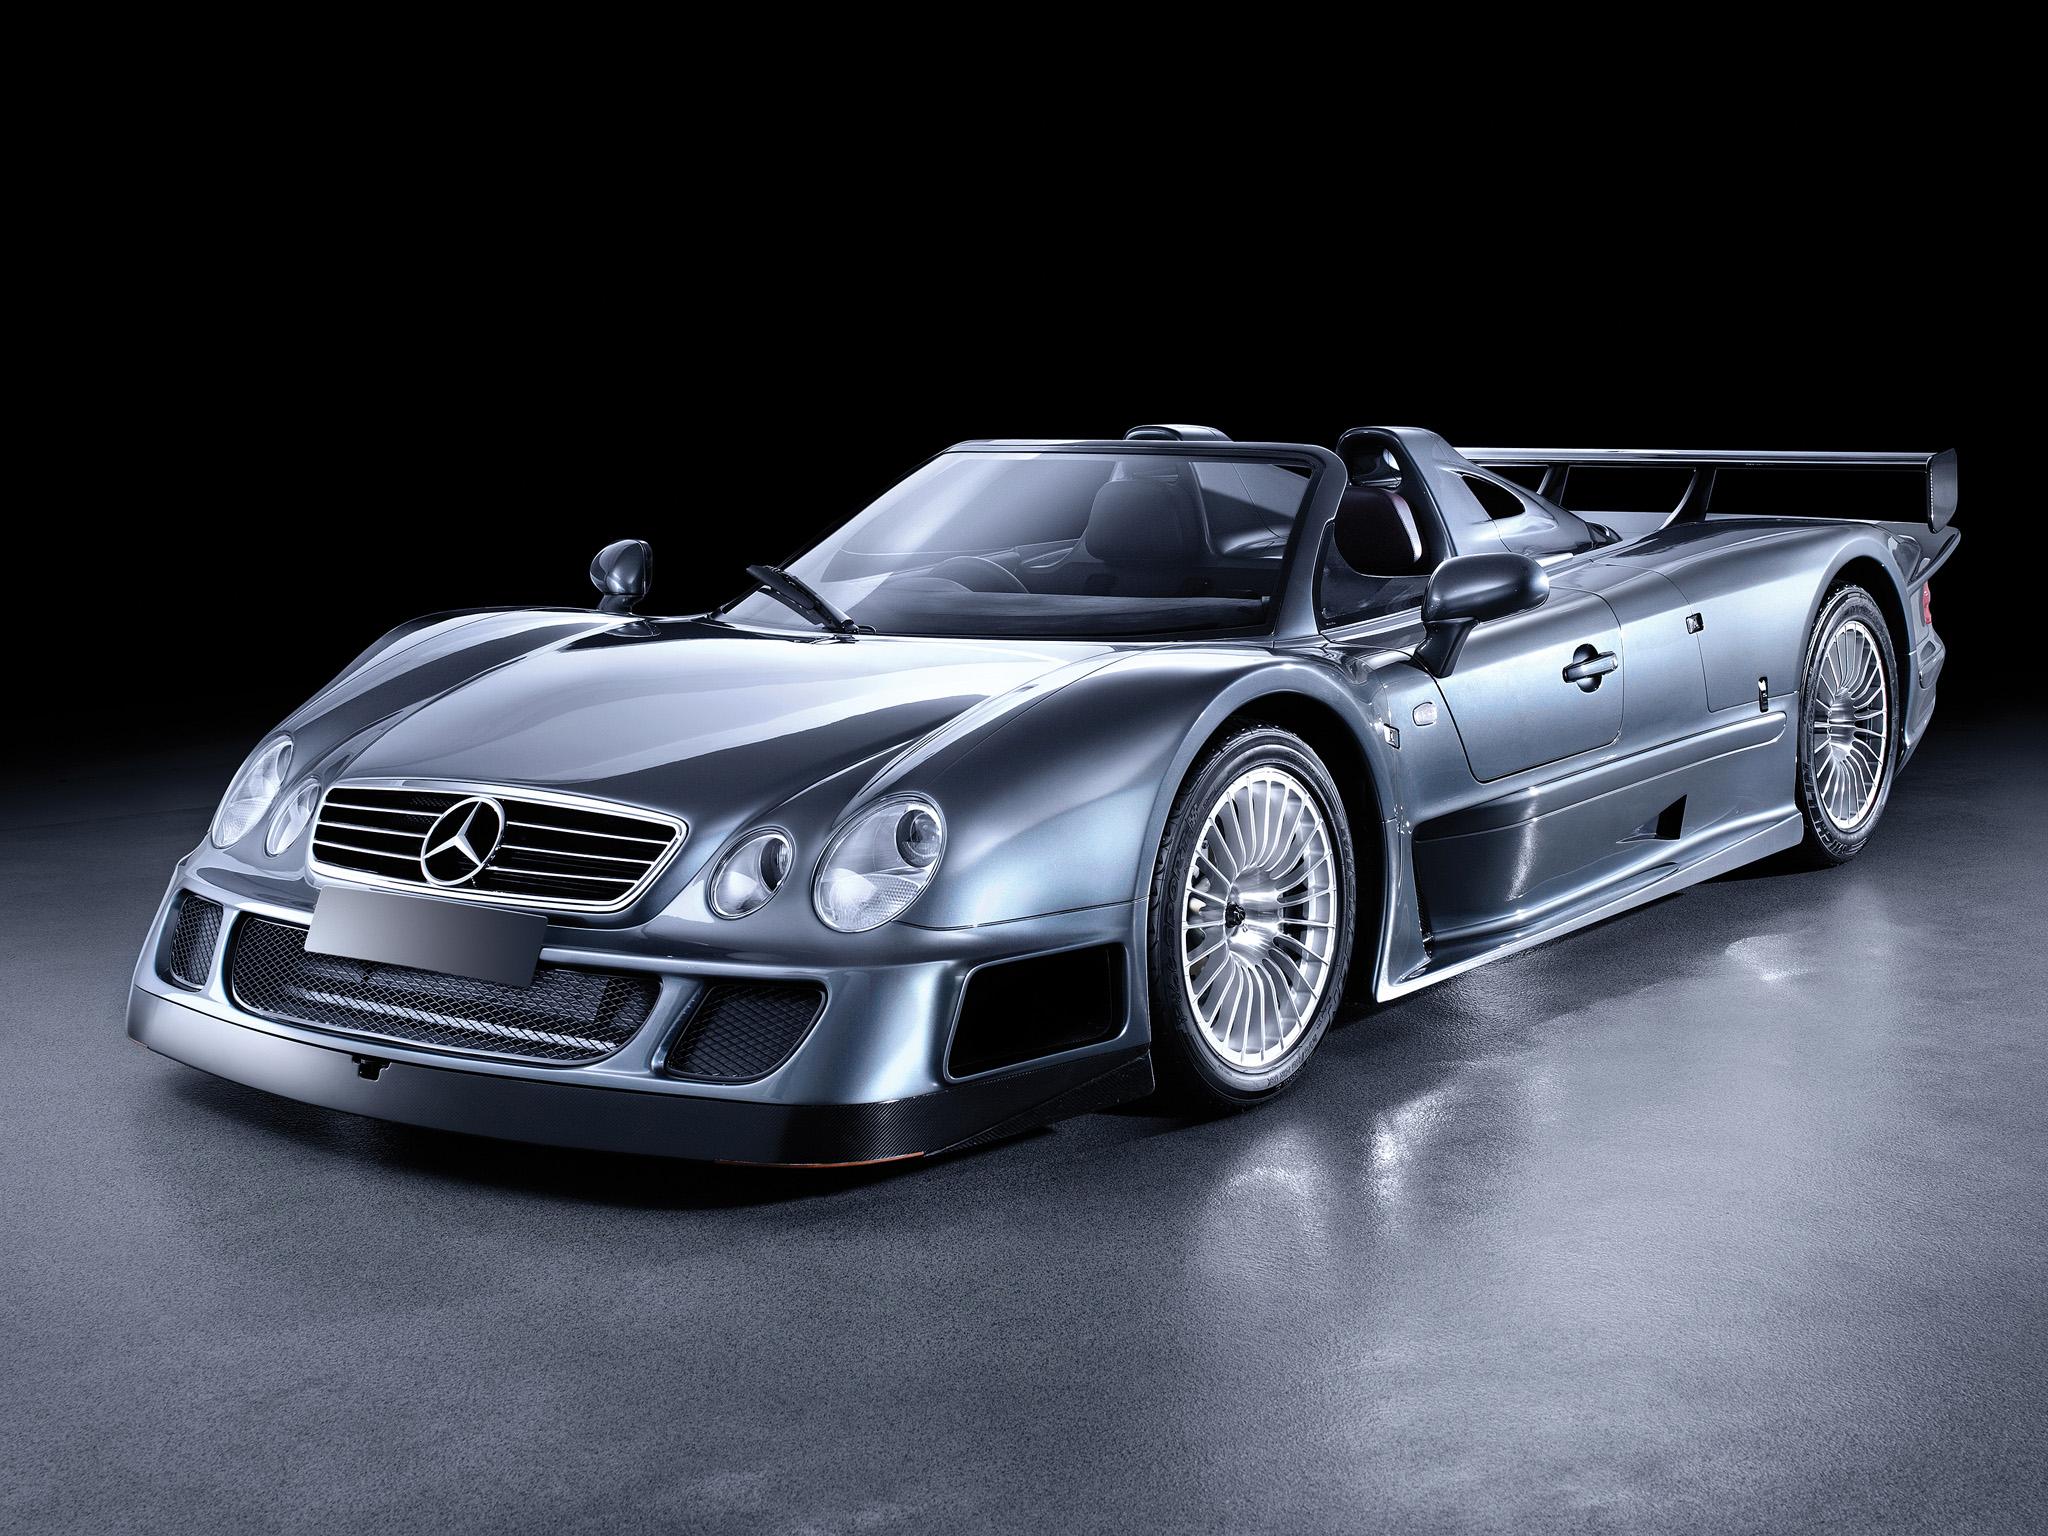 2002 mercedes benz clk gtr amg roadster supercar supercars for Mercedes benz supercar